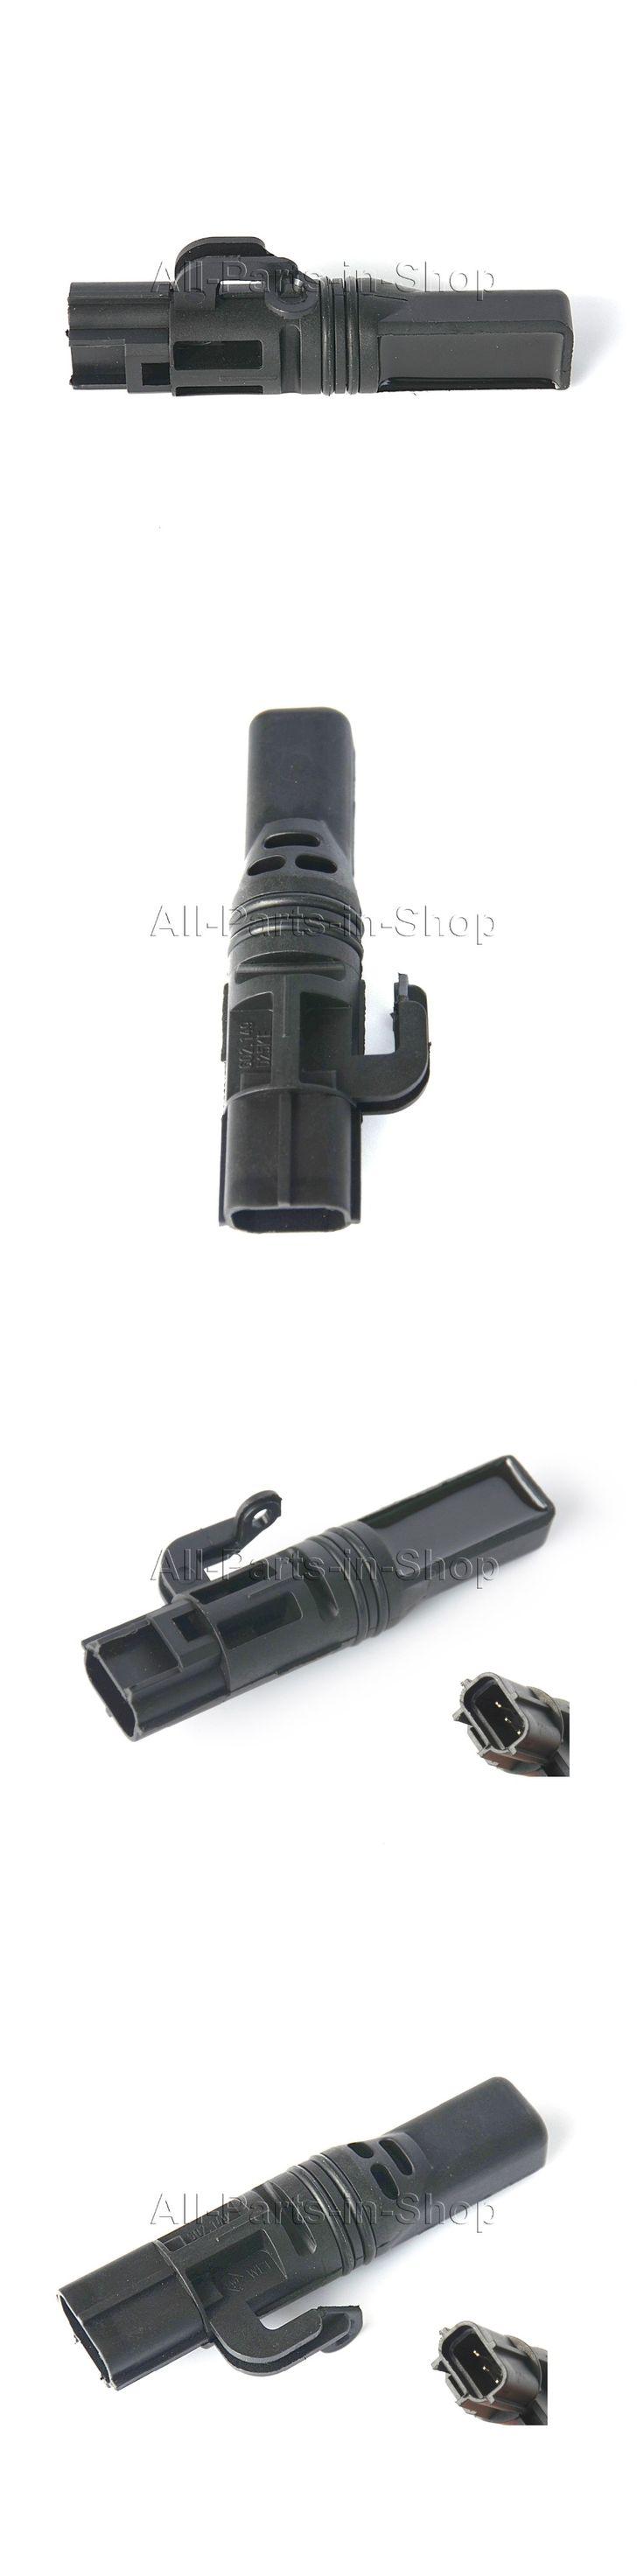 1 x Pcs New Speed Sensor Sensor for Ford Fiesta Focus Fusion for Mazda 2 OE#1062545, 1066383, 1079388, 98AB9E731AC, C202-21-551